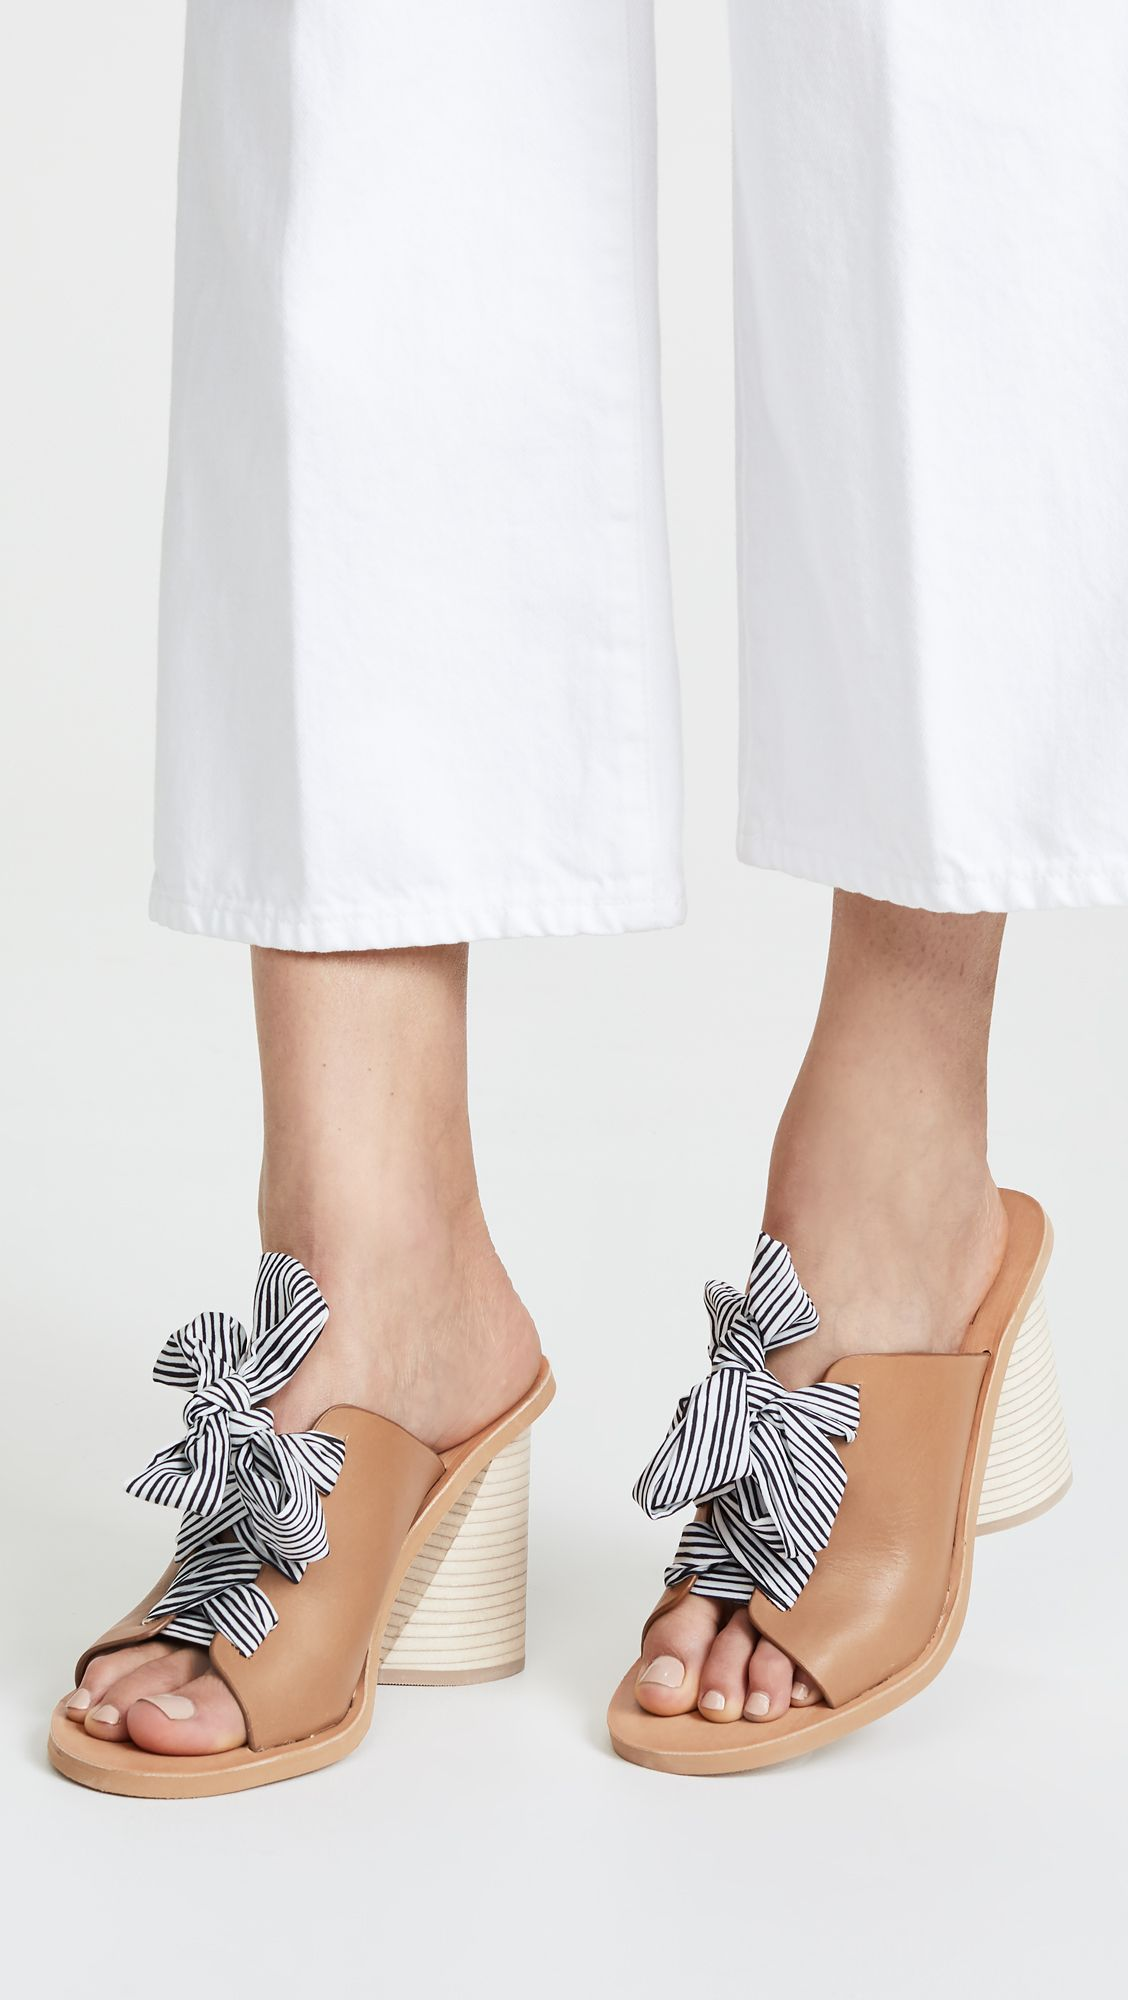 655c78fe968 Dolce Vita Amber Woven Block Heel Sandals